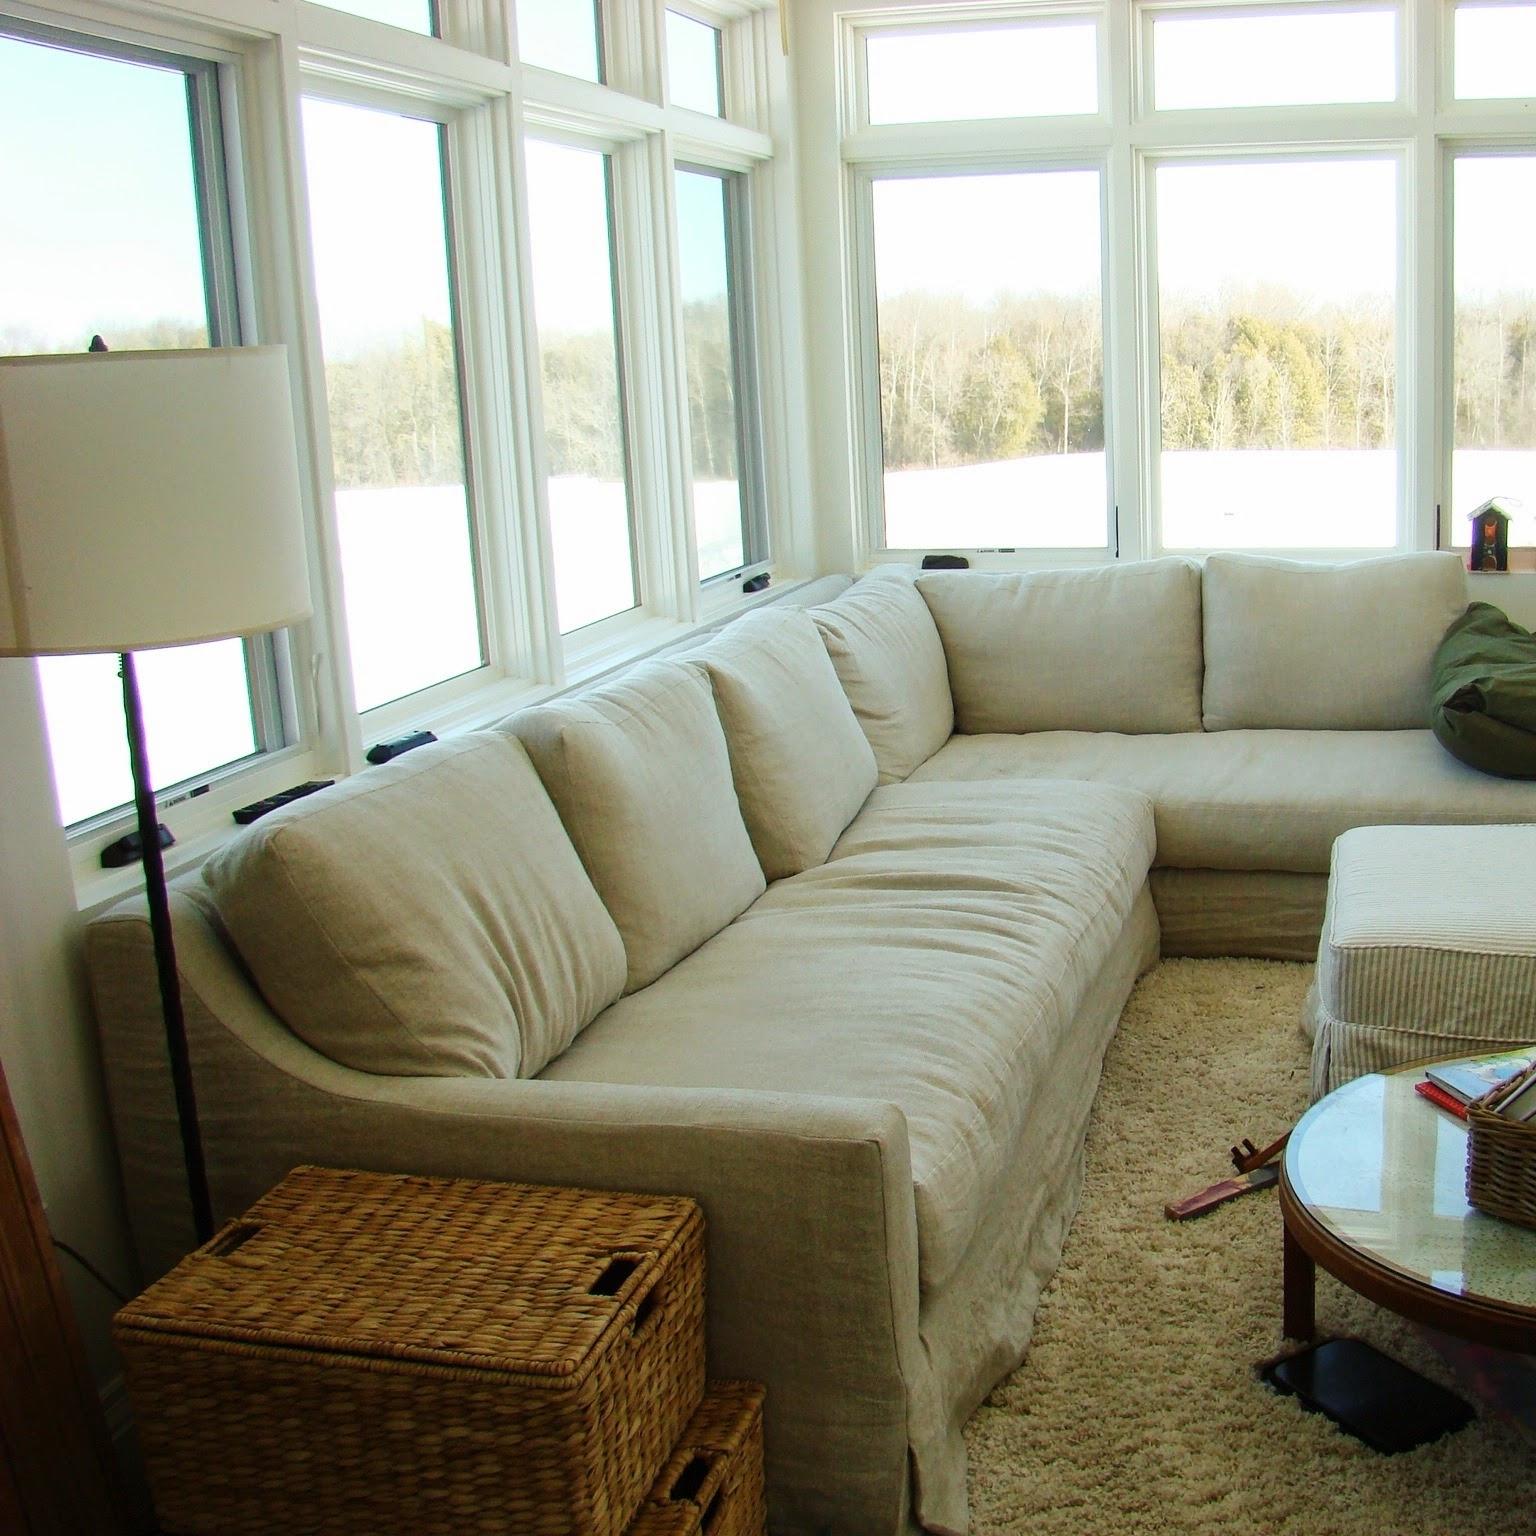 Building Walnut Farm: Belgian Linen Slipcovered Furniture Intended For Restoration Hardware Sectional Sofas (Image 3 of 10)